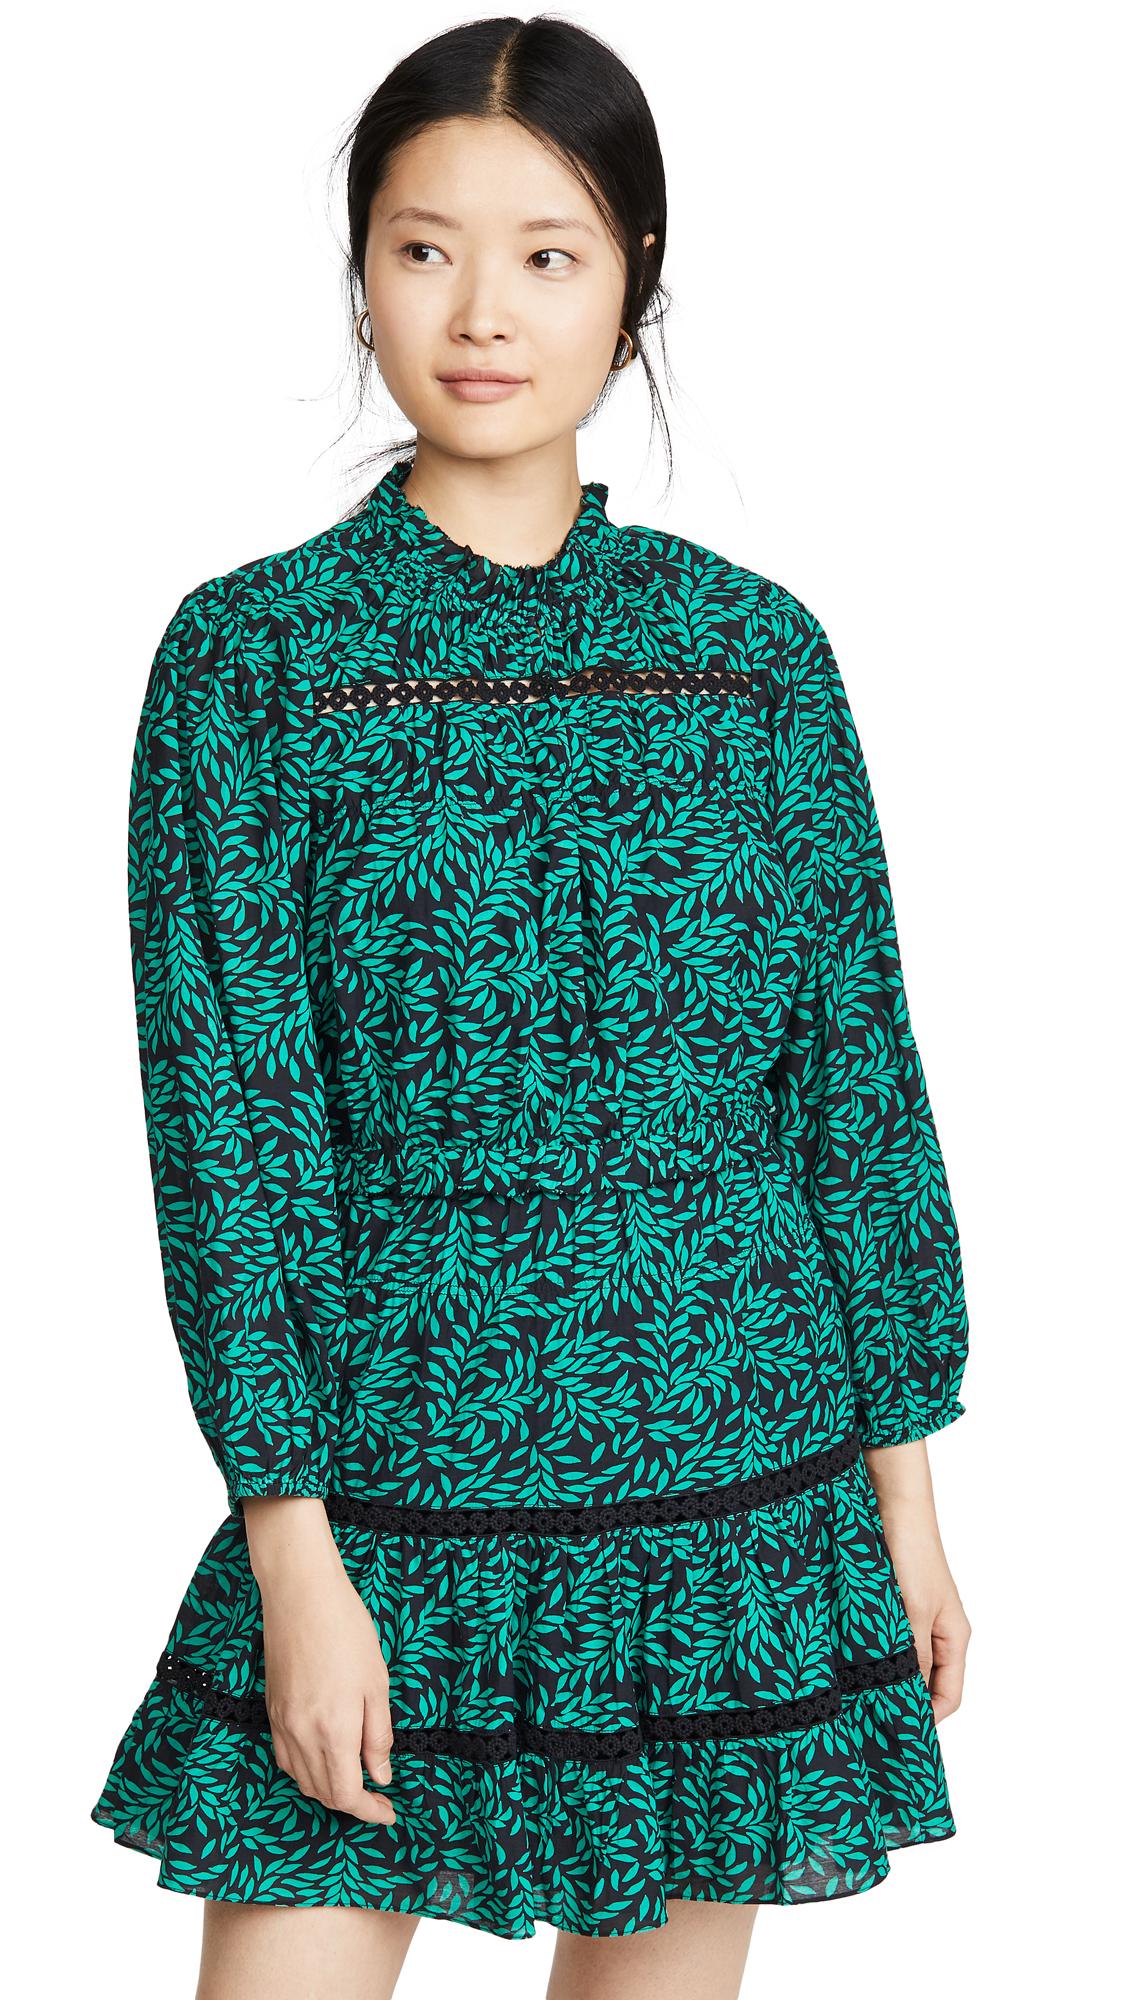 Joie Salama Dress - 60% Off Sale